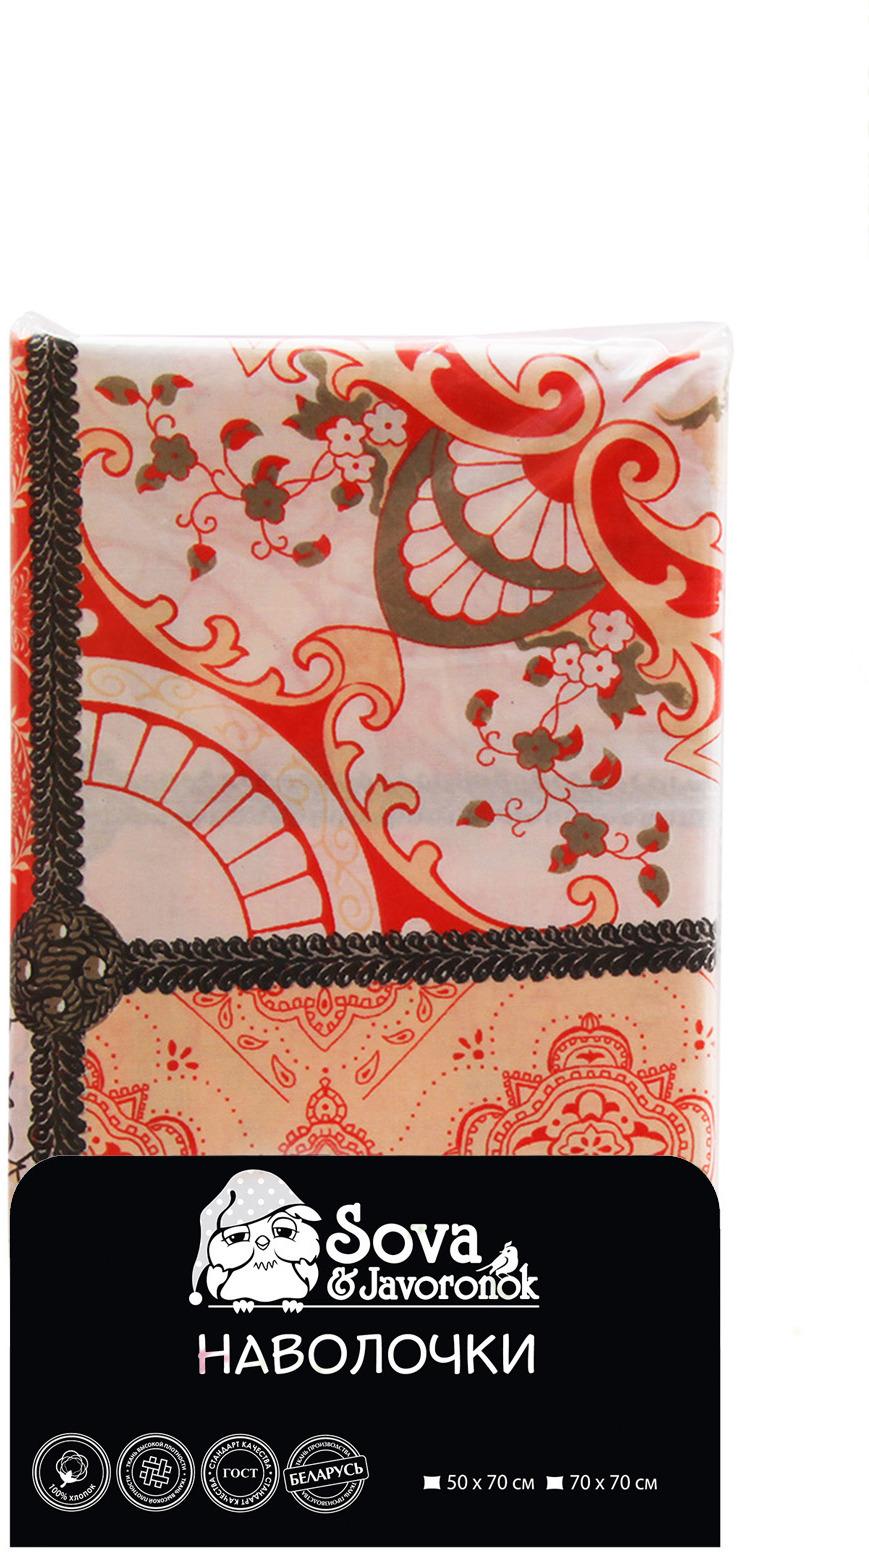 Фото - Наволочка Sova & Javoronok Шафран, 50 х 70 см, 2 шт наволочка комплект махровых наволочек яблоня 50 70 см